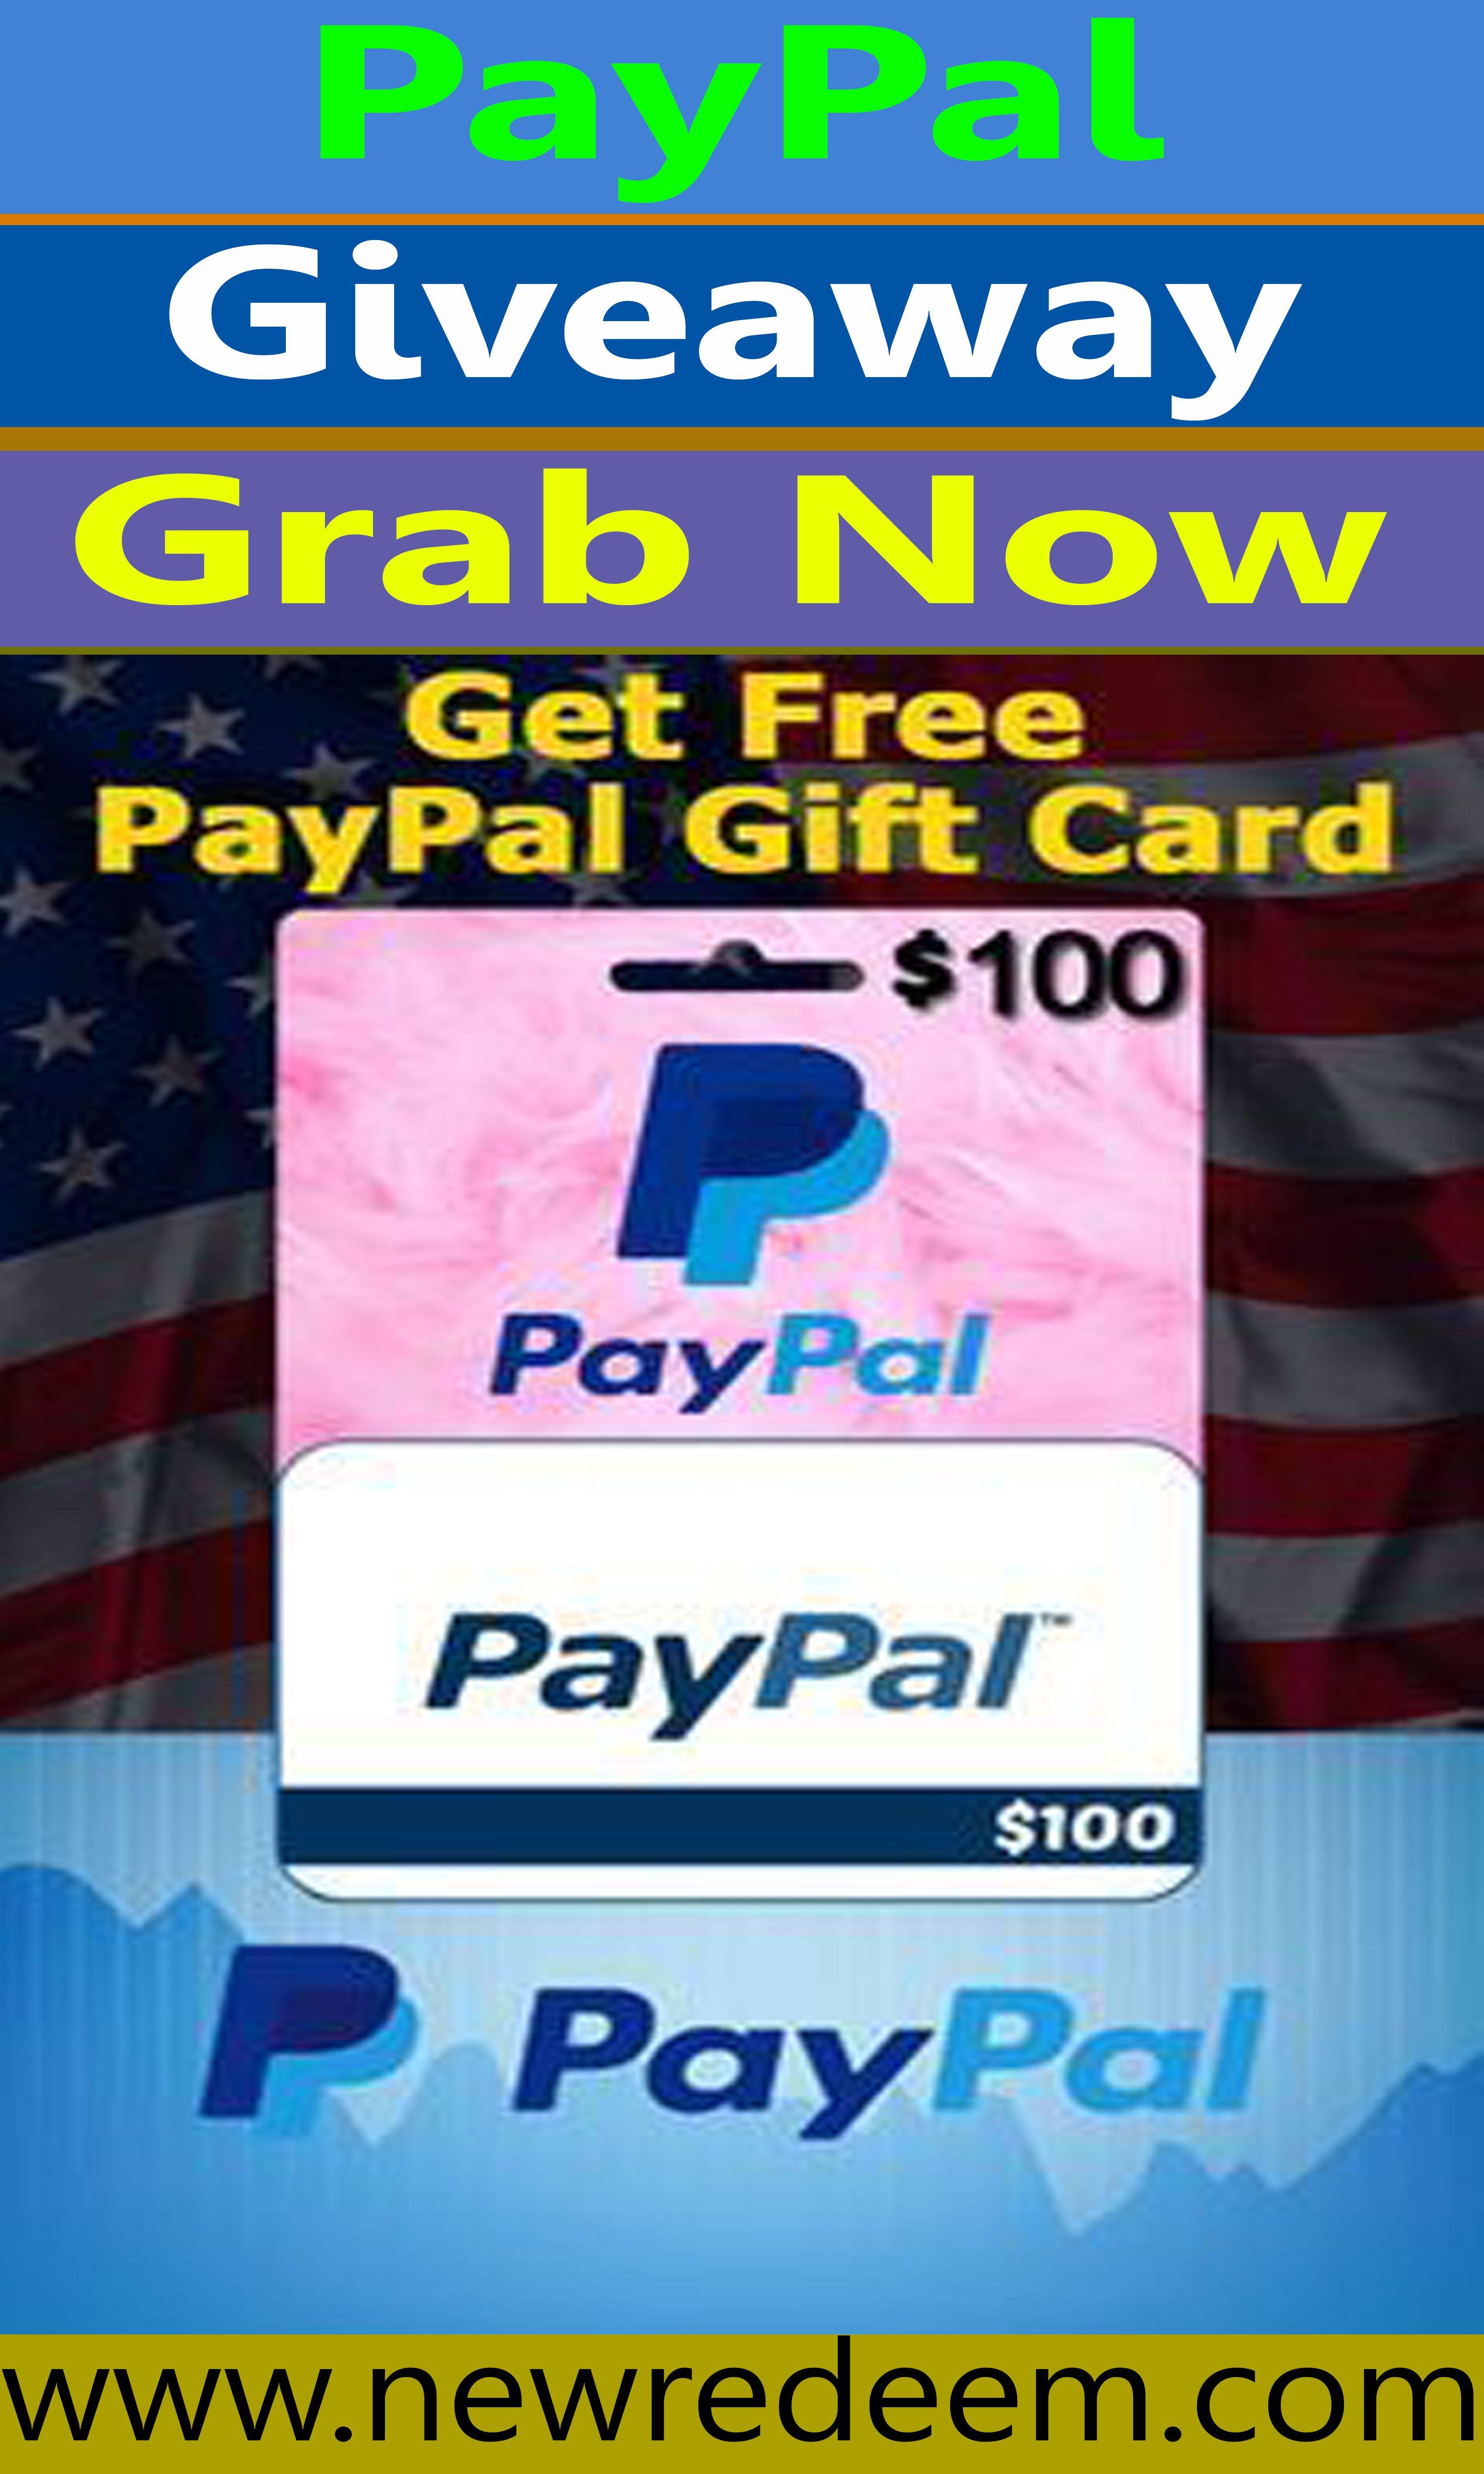 Free paypal money hack generator 2020 in 2020 paypal